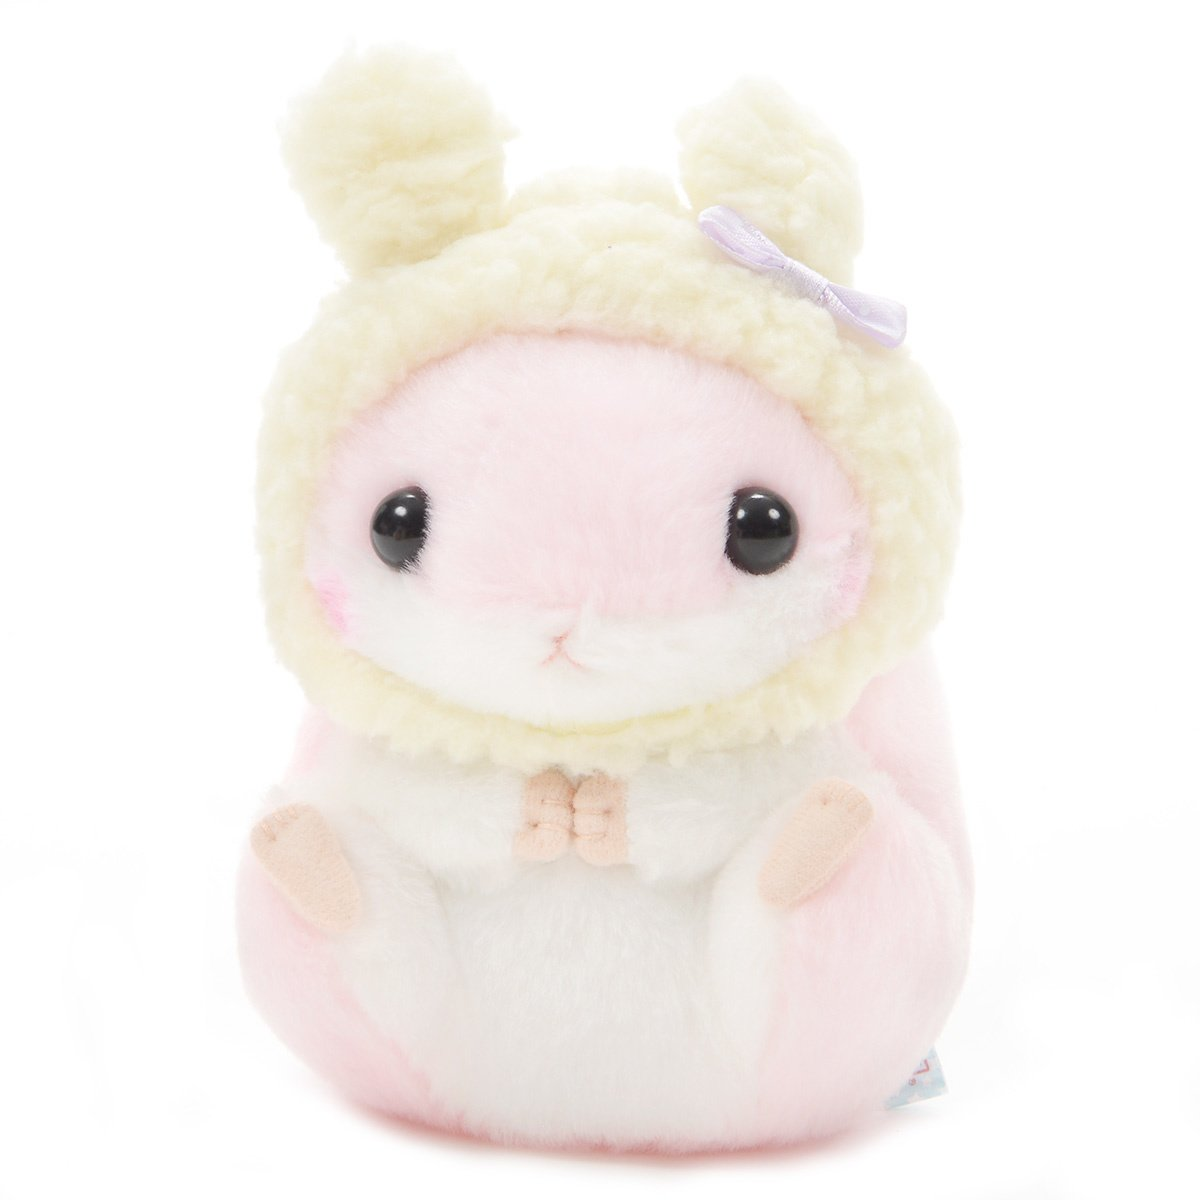 Hamster Plush Doll Amuse Coroham Coron Winter Plush Collection Momo-chan Pink 5 Inches